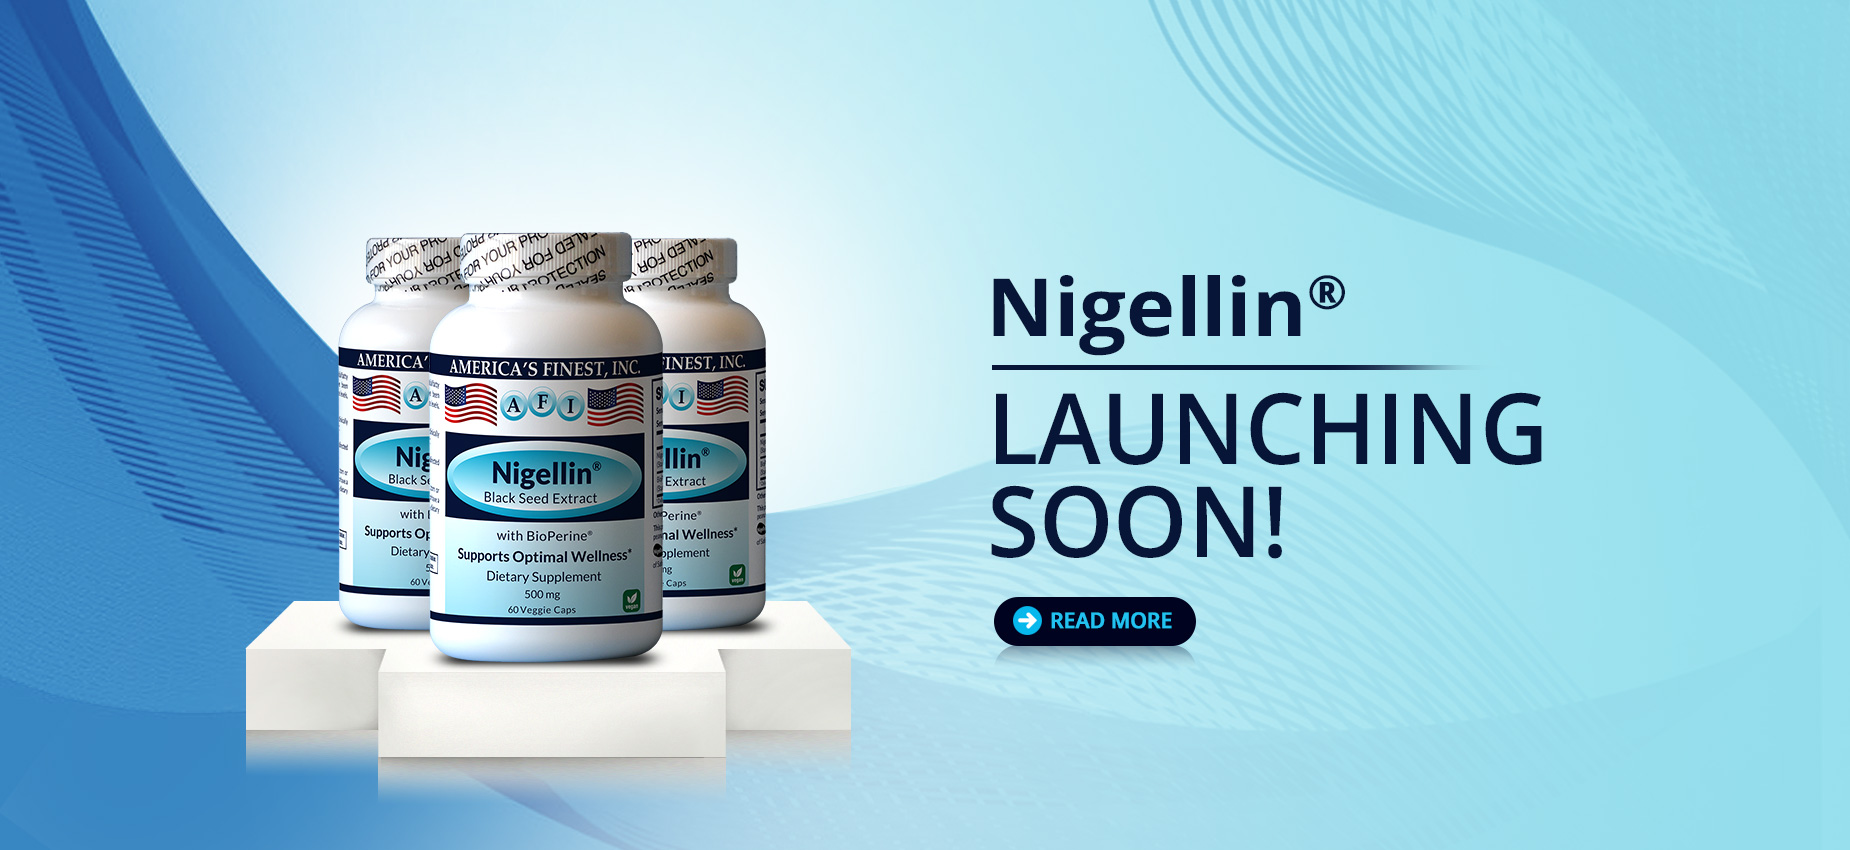 nigellin-banner